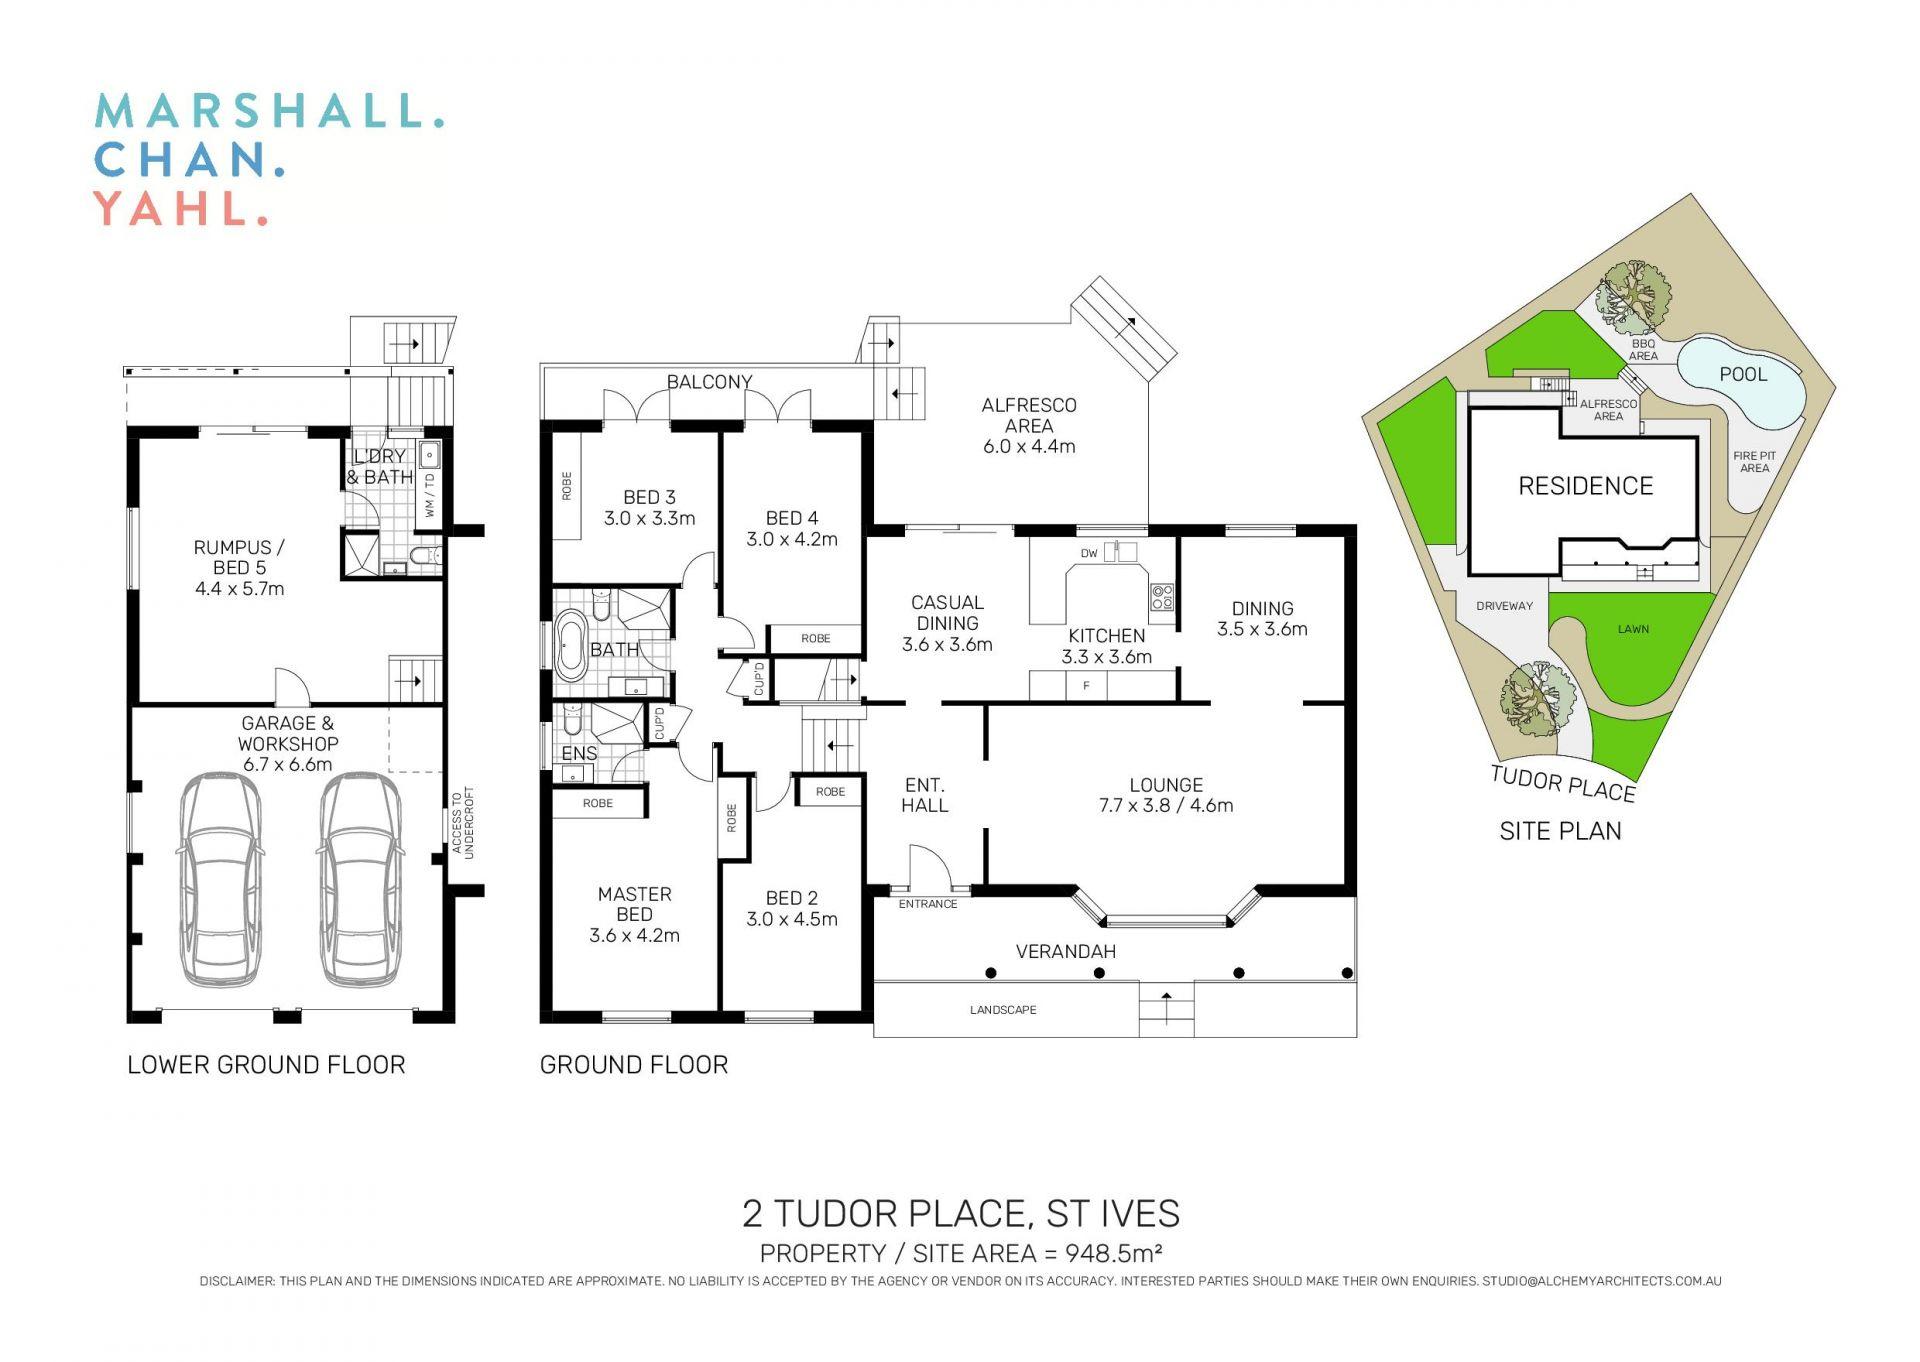 2 Tudor Place St Ives 2075